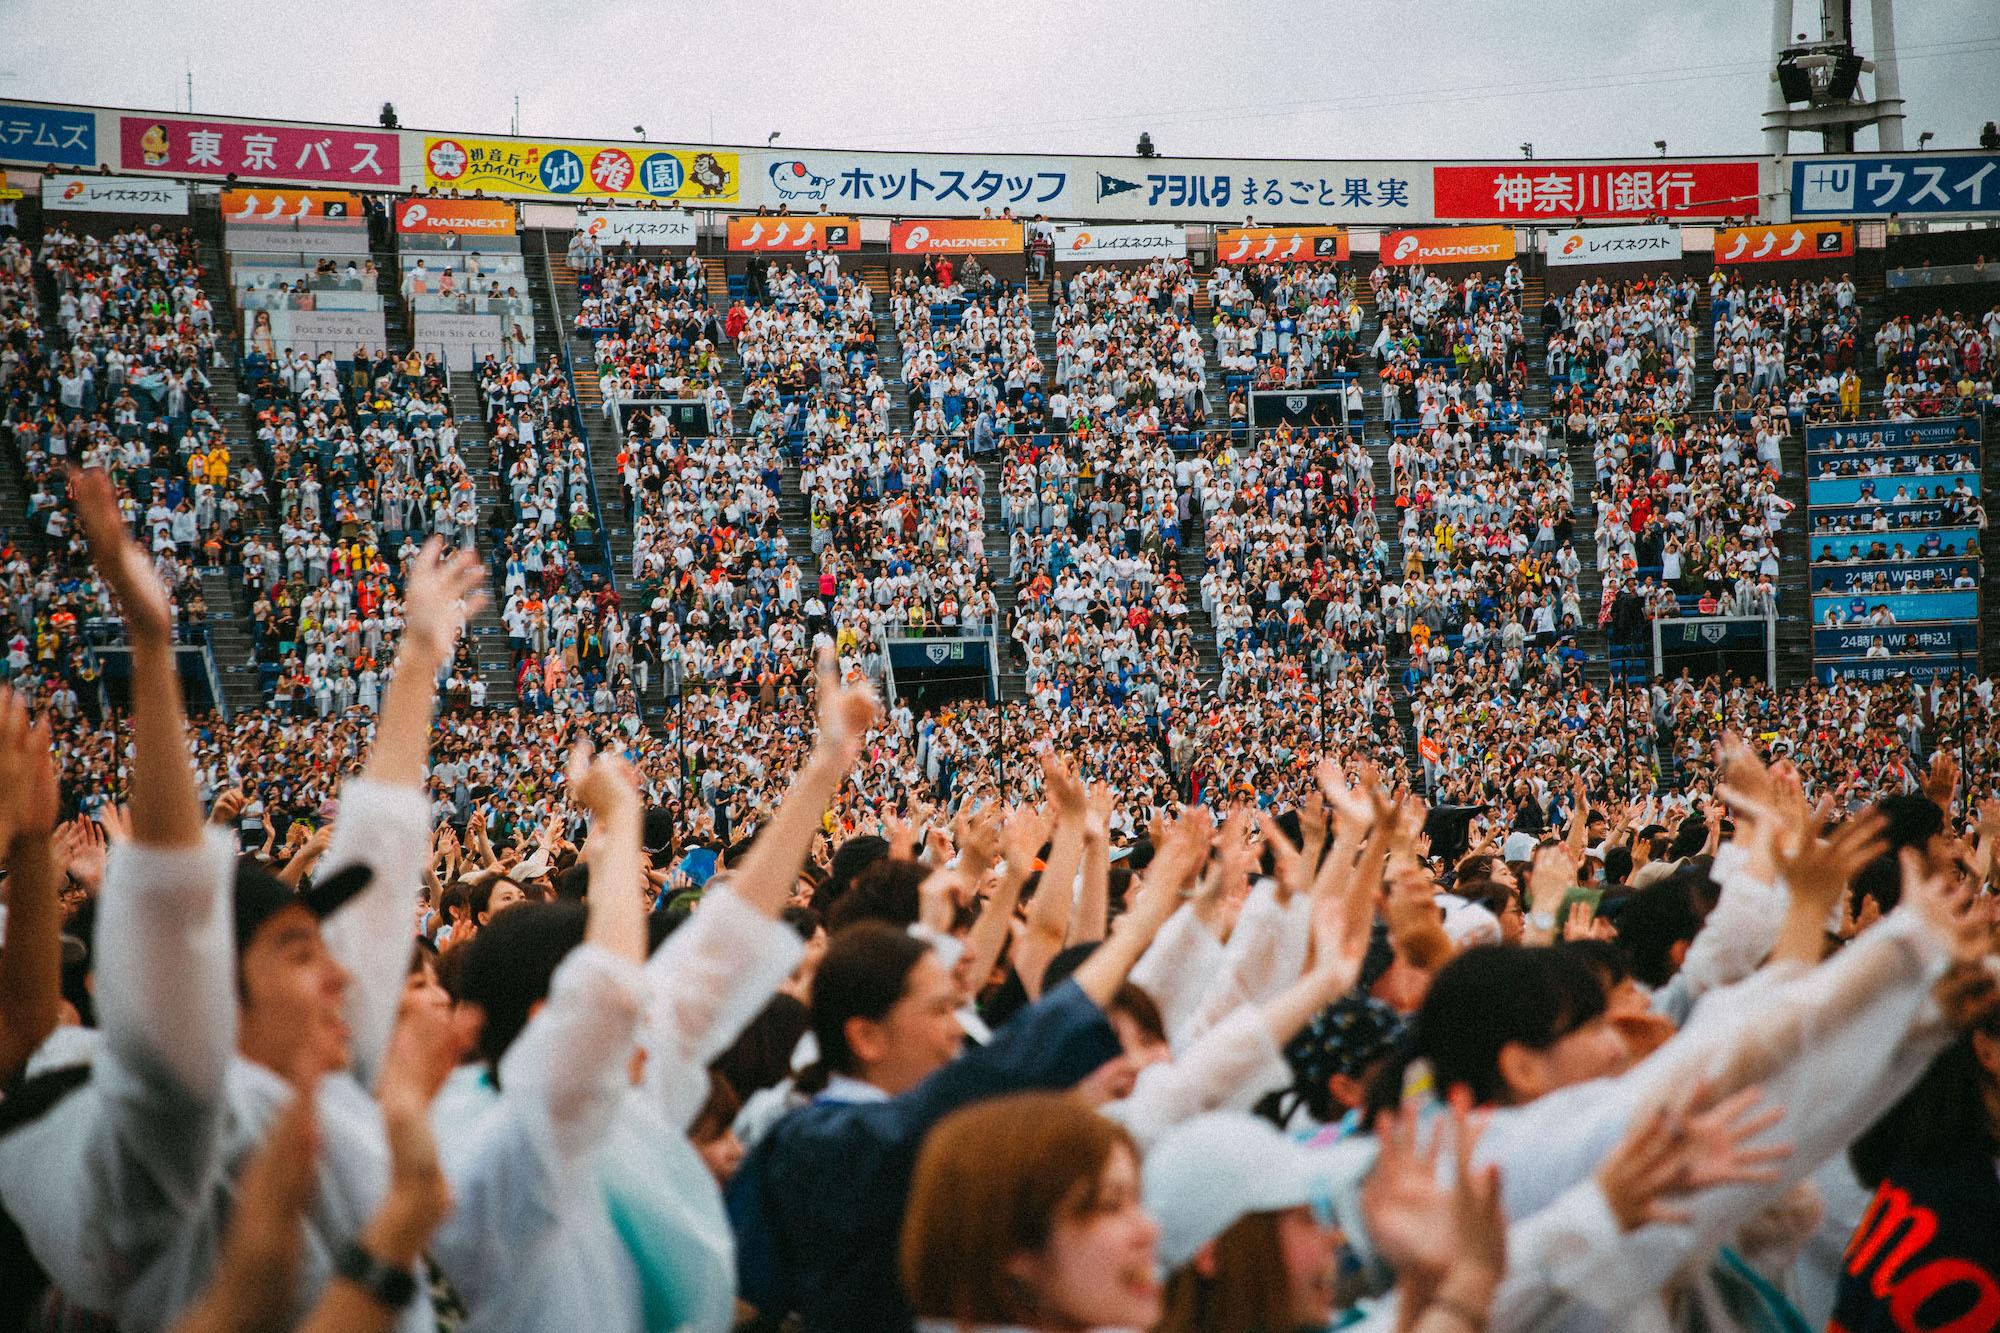 【Photo Documentary】Suchmos THE LIVE 横浜スタジアム report0920_suchmos_12